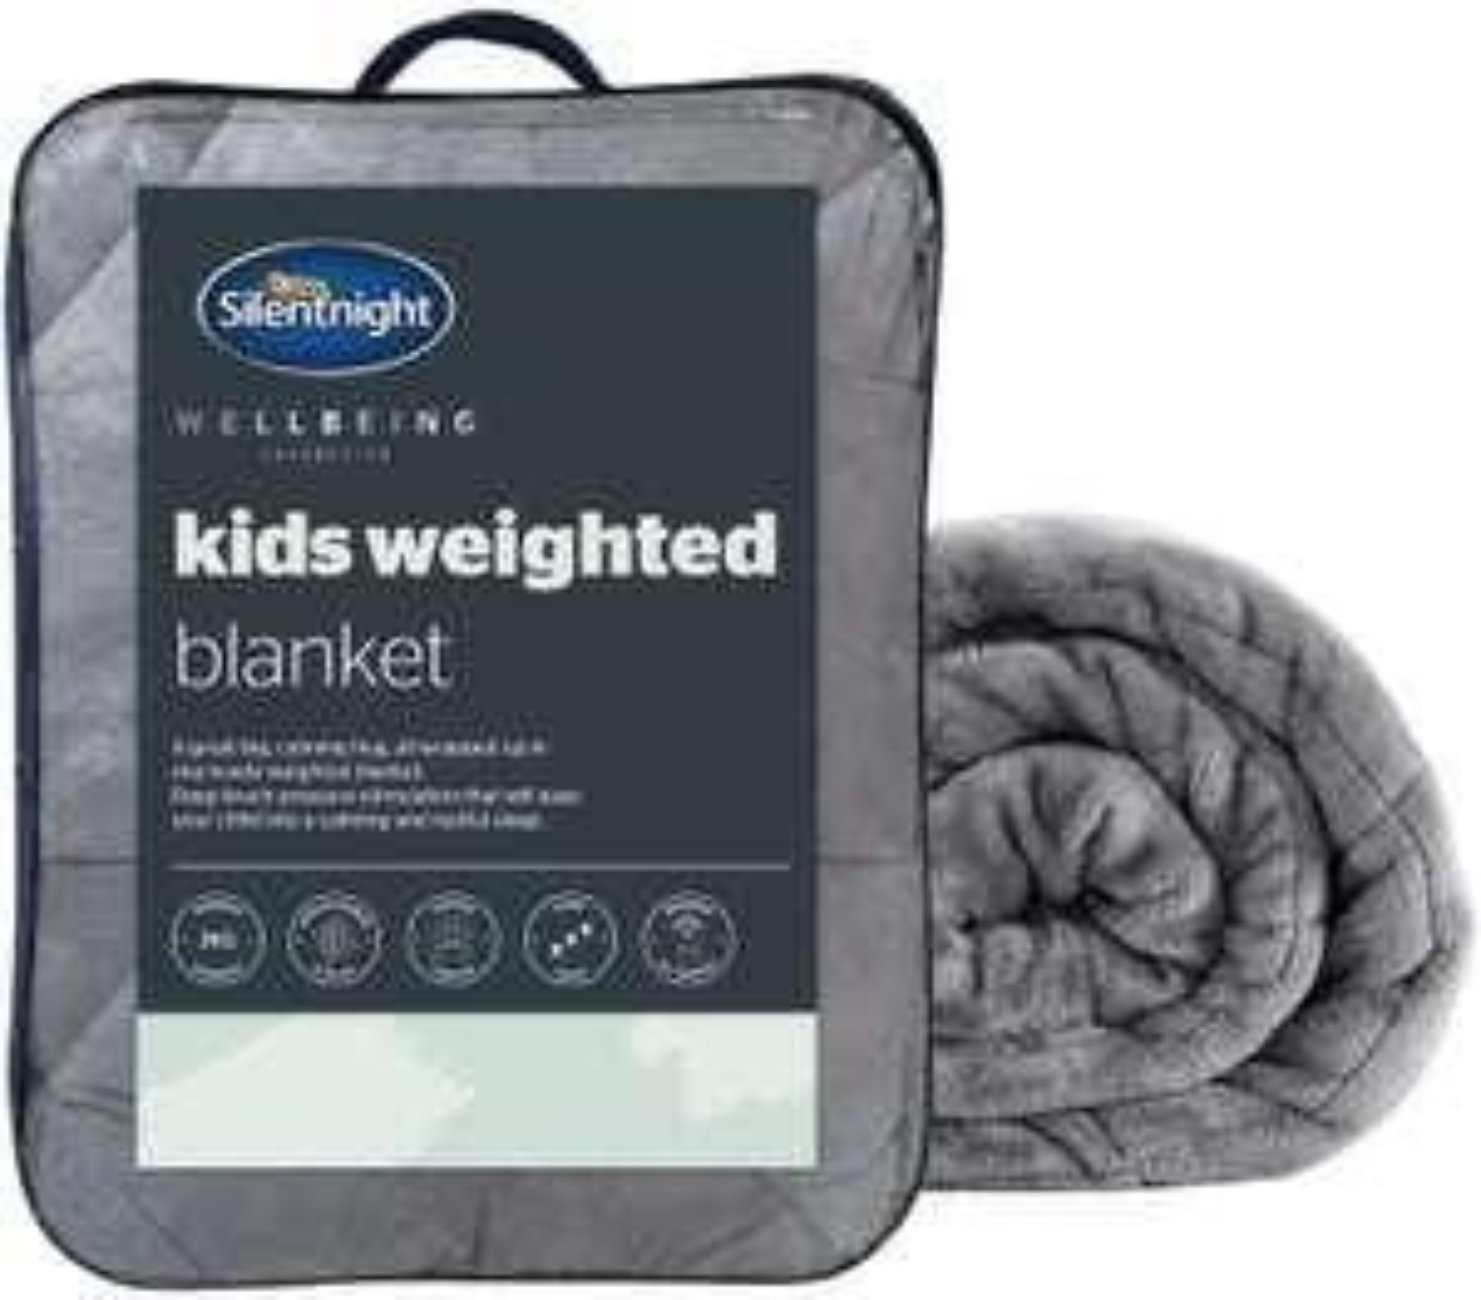 Silentnight Kids Weighted Blanket - £7.50 instore @ Tesco